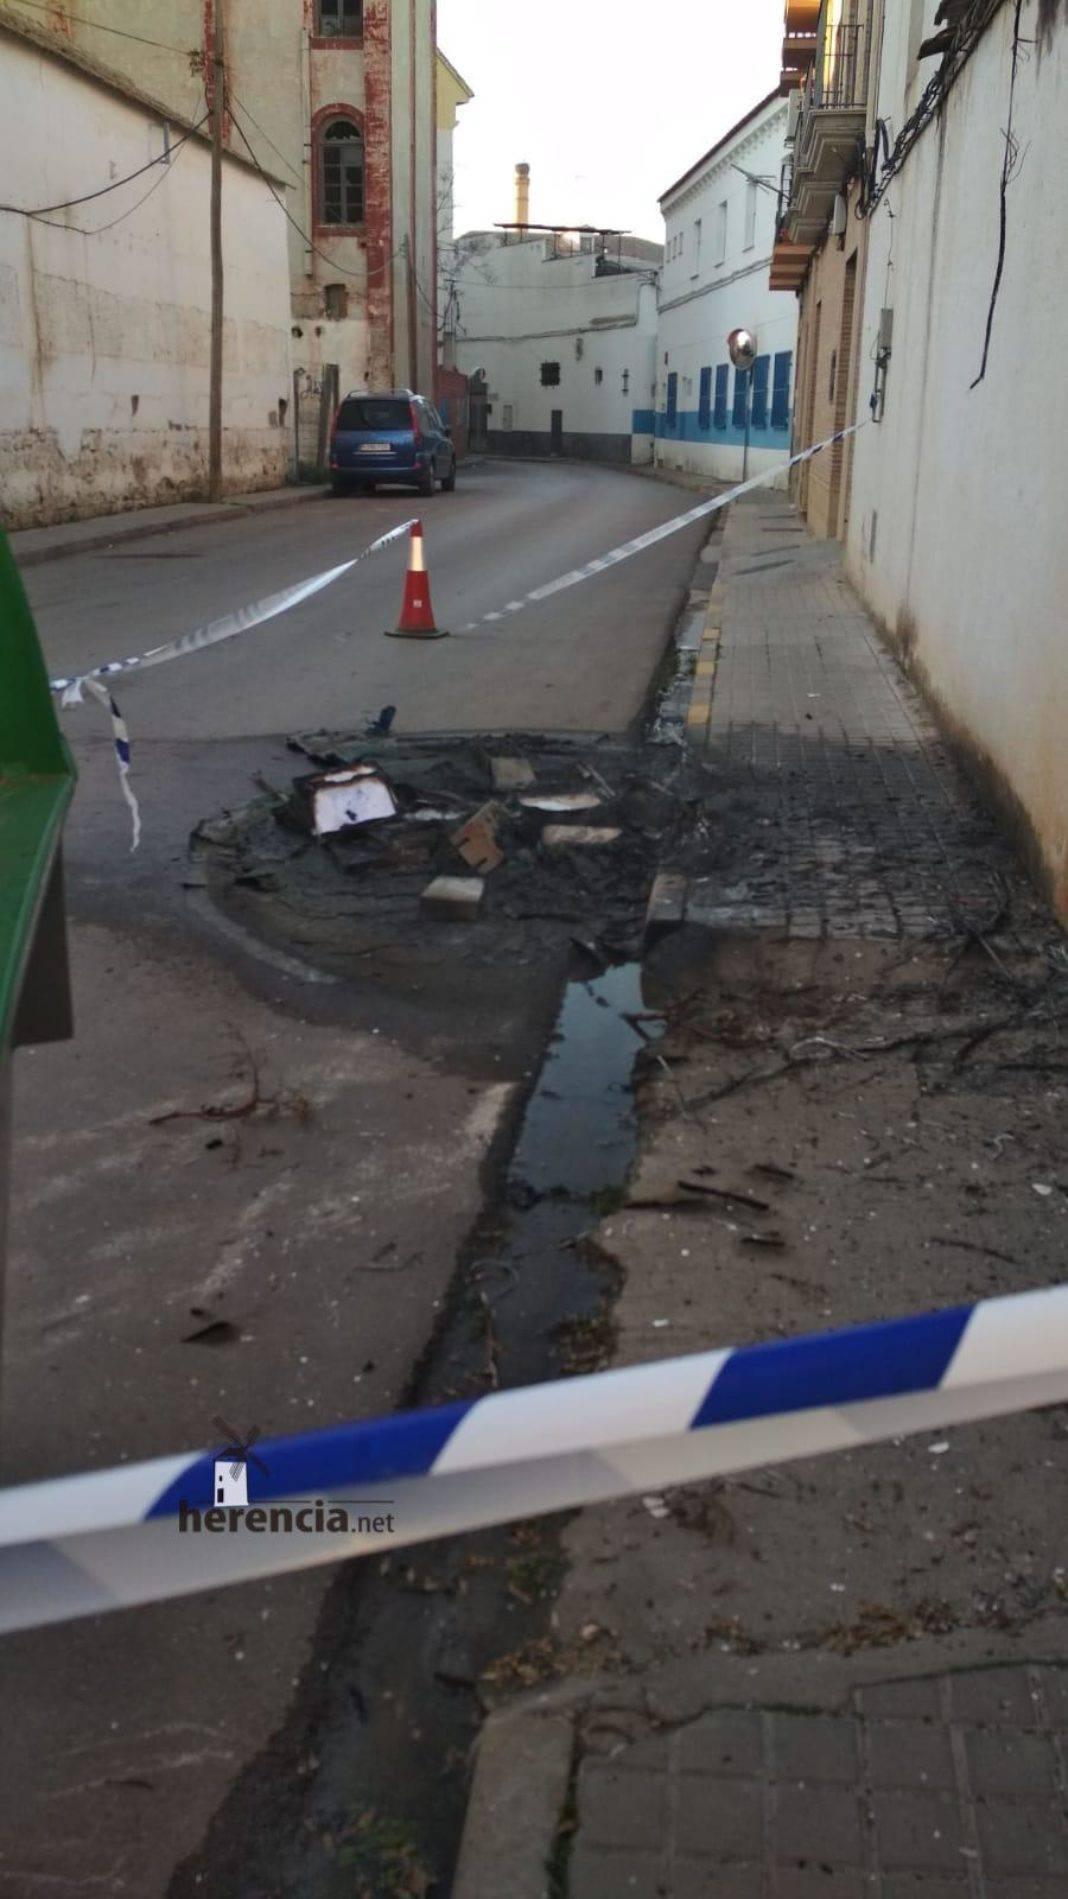 arde contenedor en calle gomez montalban herencia 0004 1068x1899 - Arde un contenedor en la calle Gómez Montalbán de Herencia